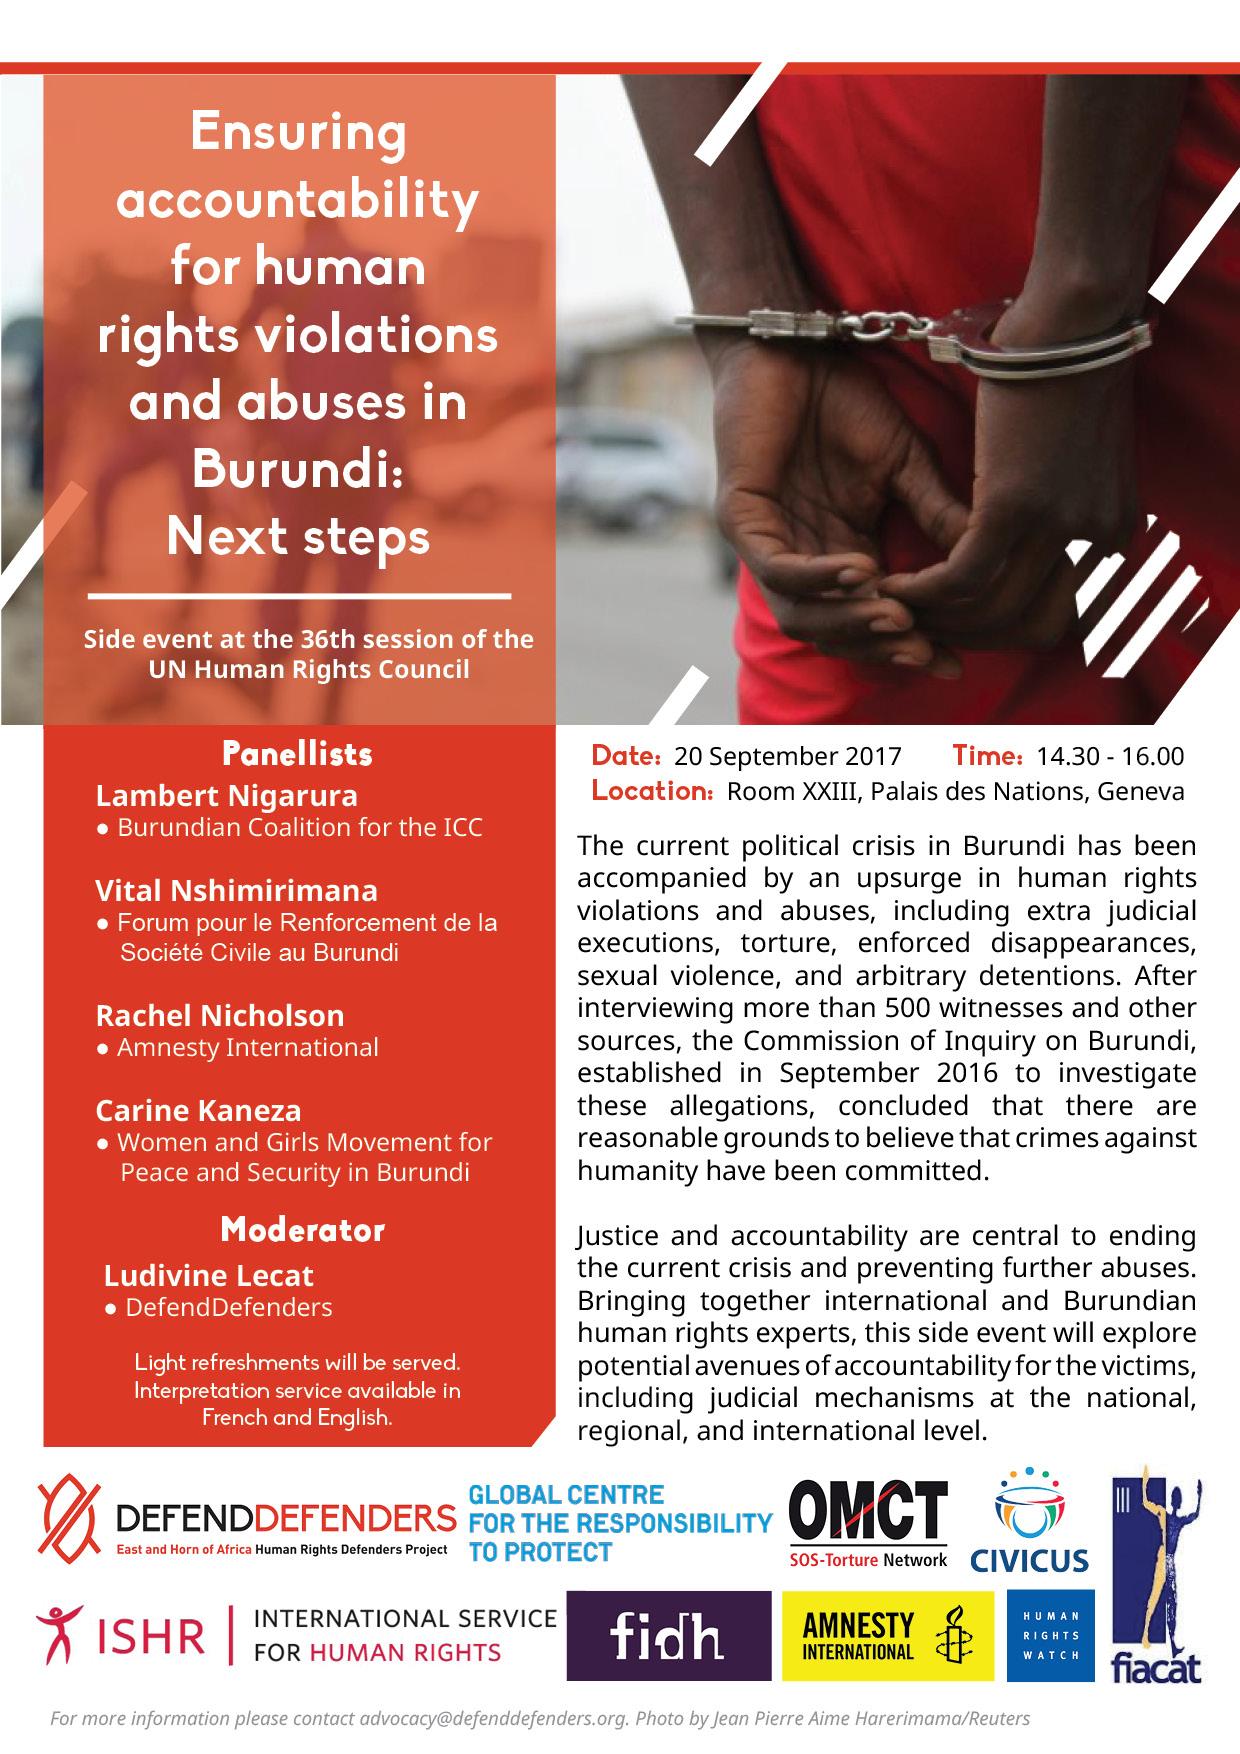 a description of human rights violations against women